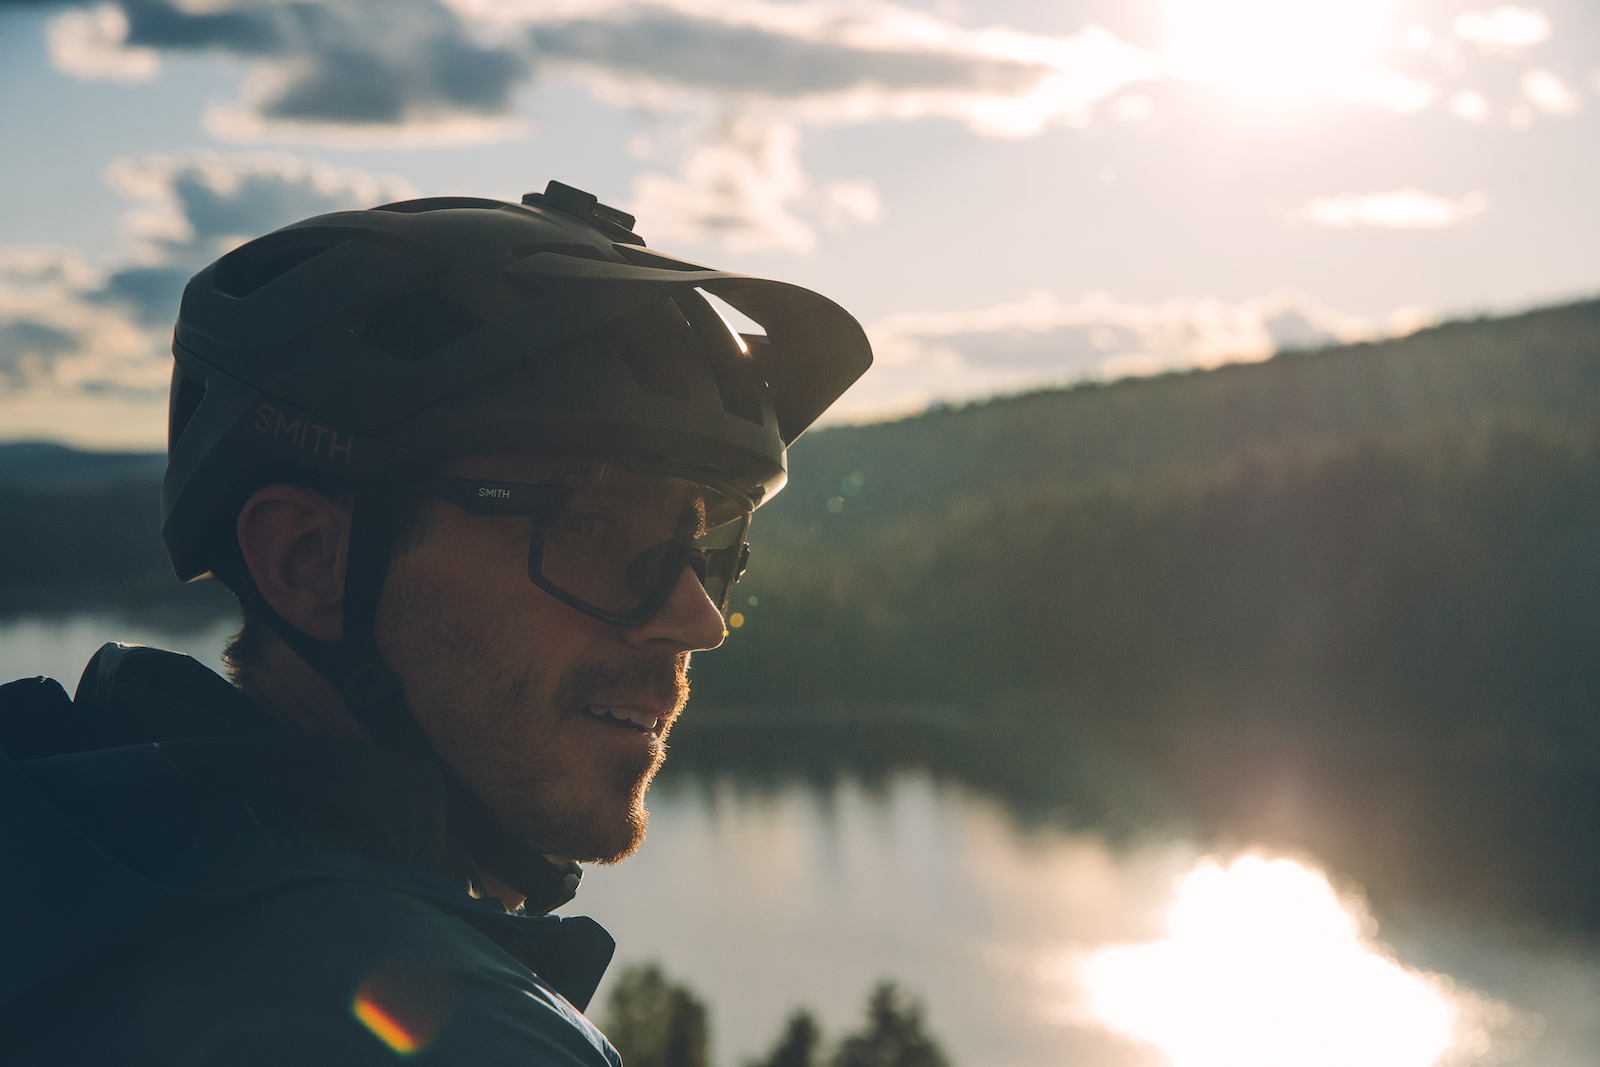 Braydon Bringhusrt overlooking Payette Lake in McCall